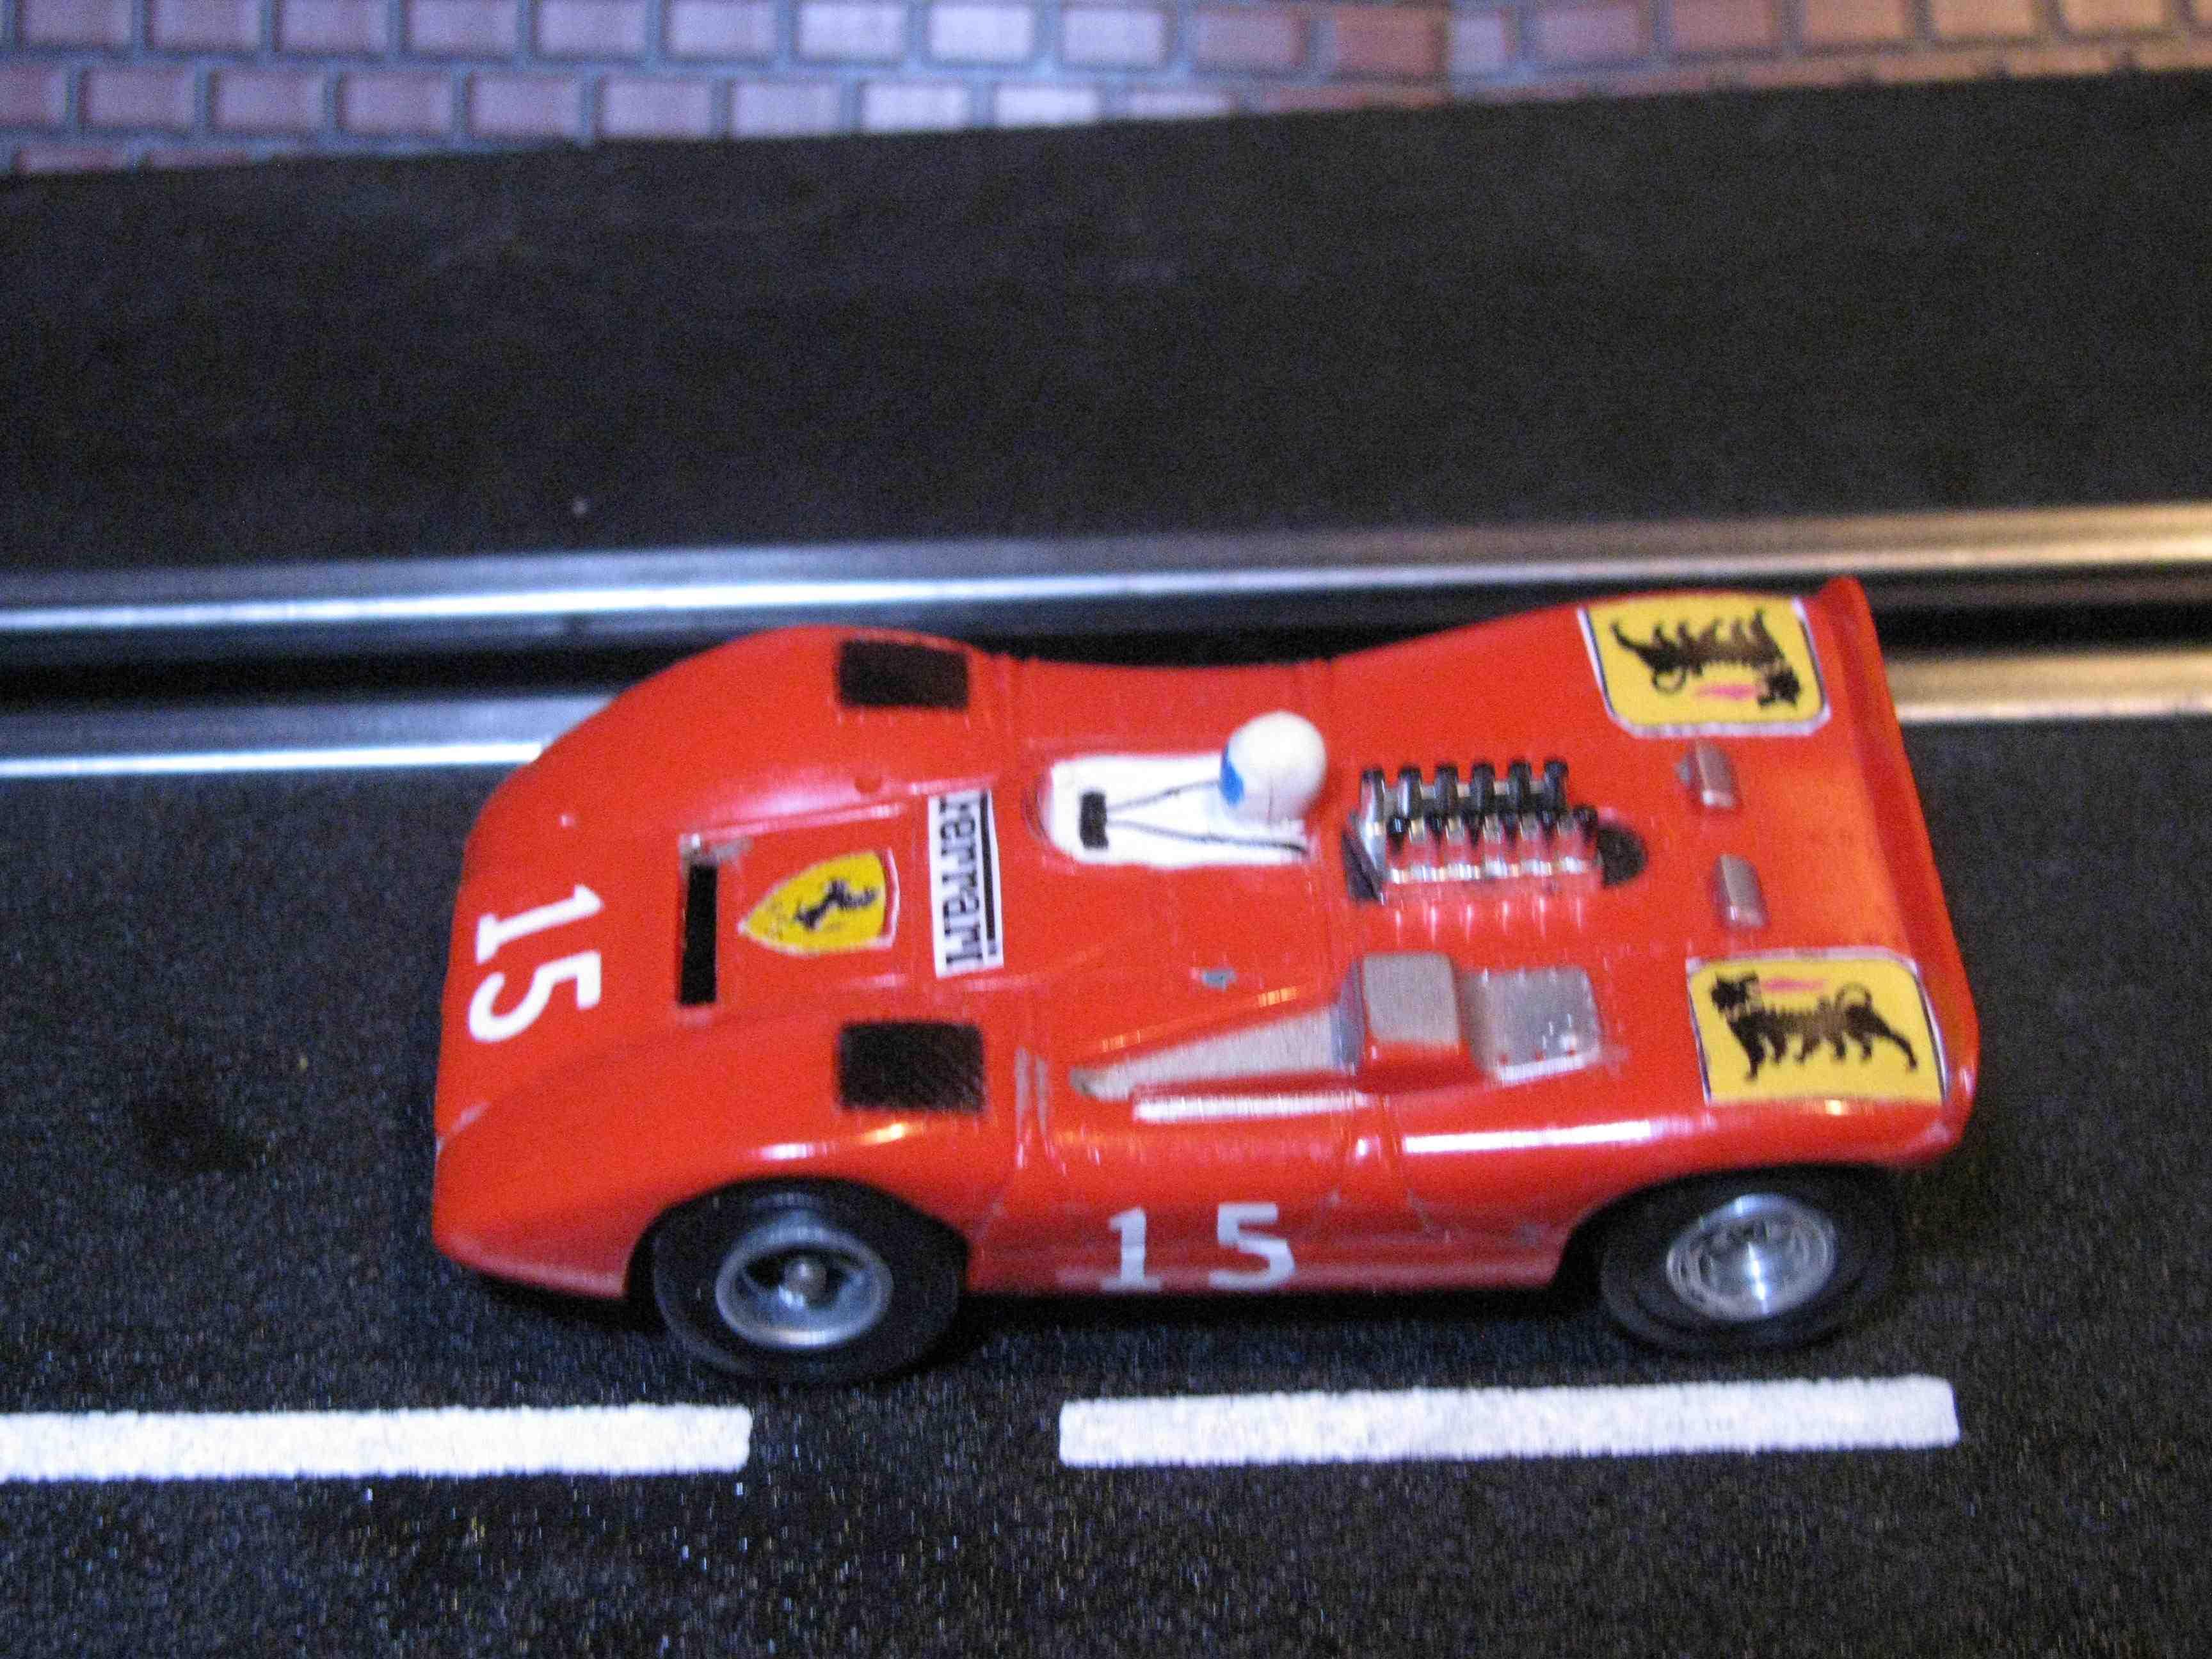 * SOLD * Aurora 1751-750 A/FX Ferrari 612 HO Slot Car - Red